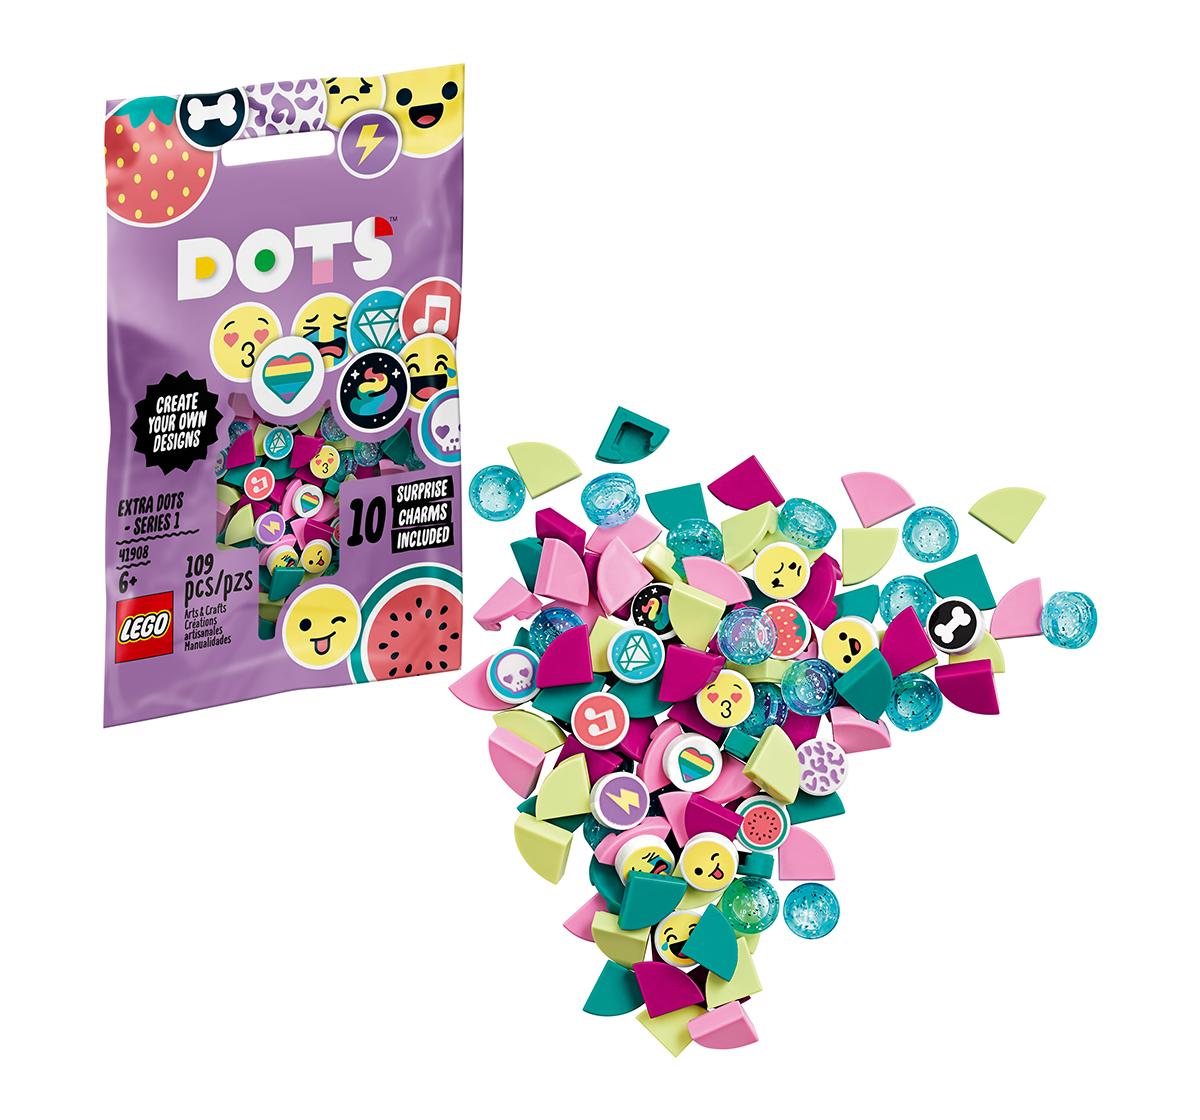 LEGO | LEGO 41908 EXTRA DOTS - Series 1  Lego Blocks for Girls age 6Y+